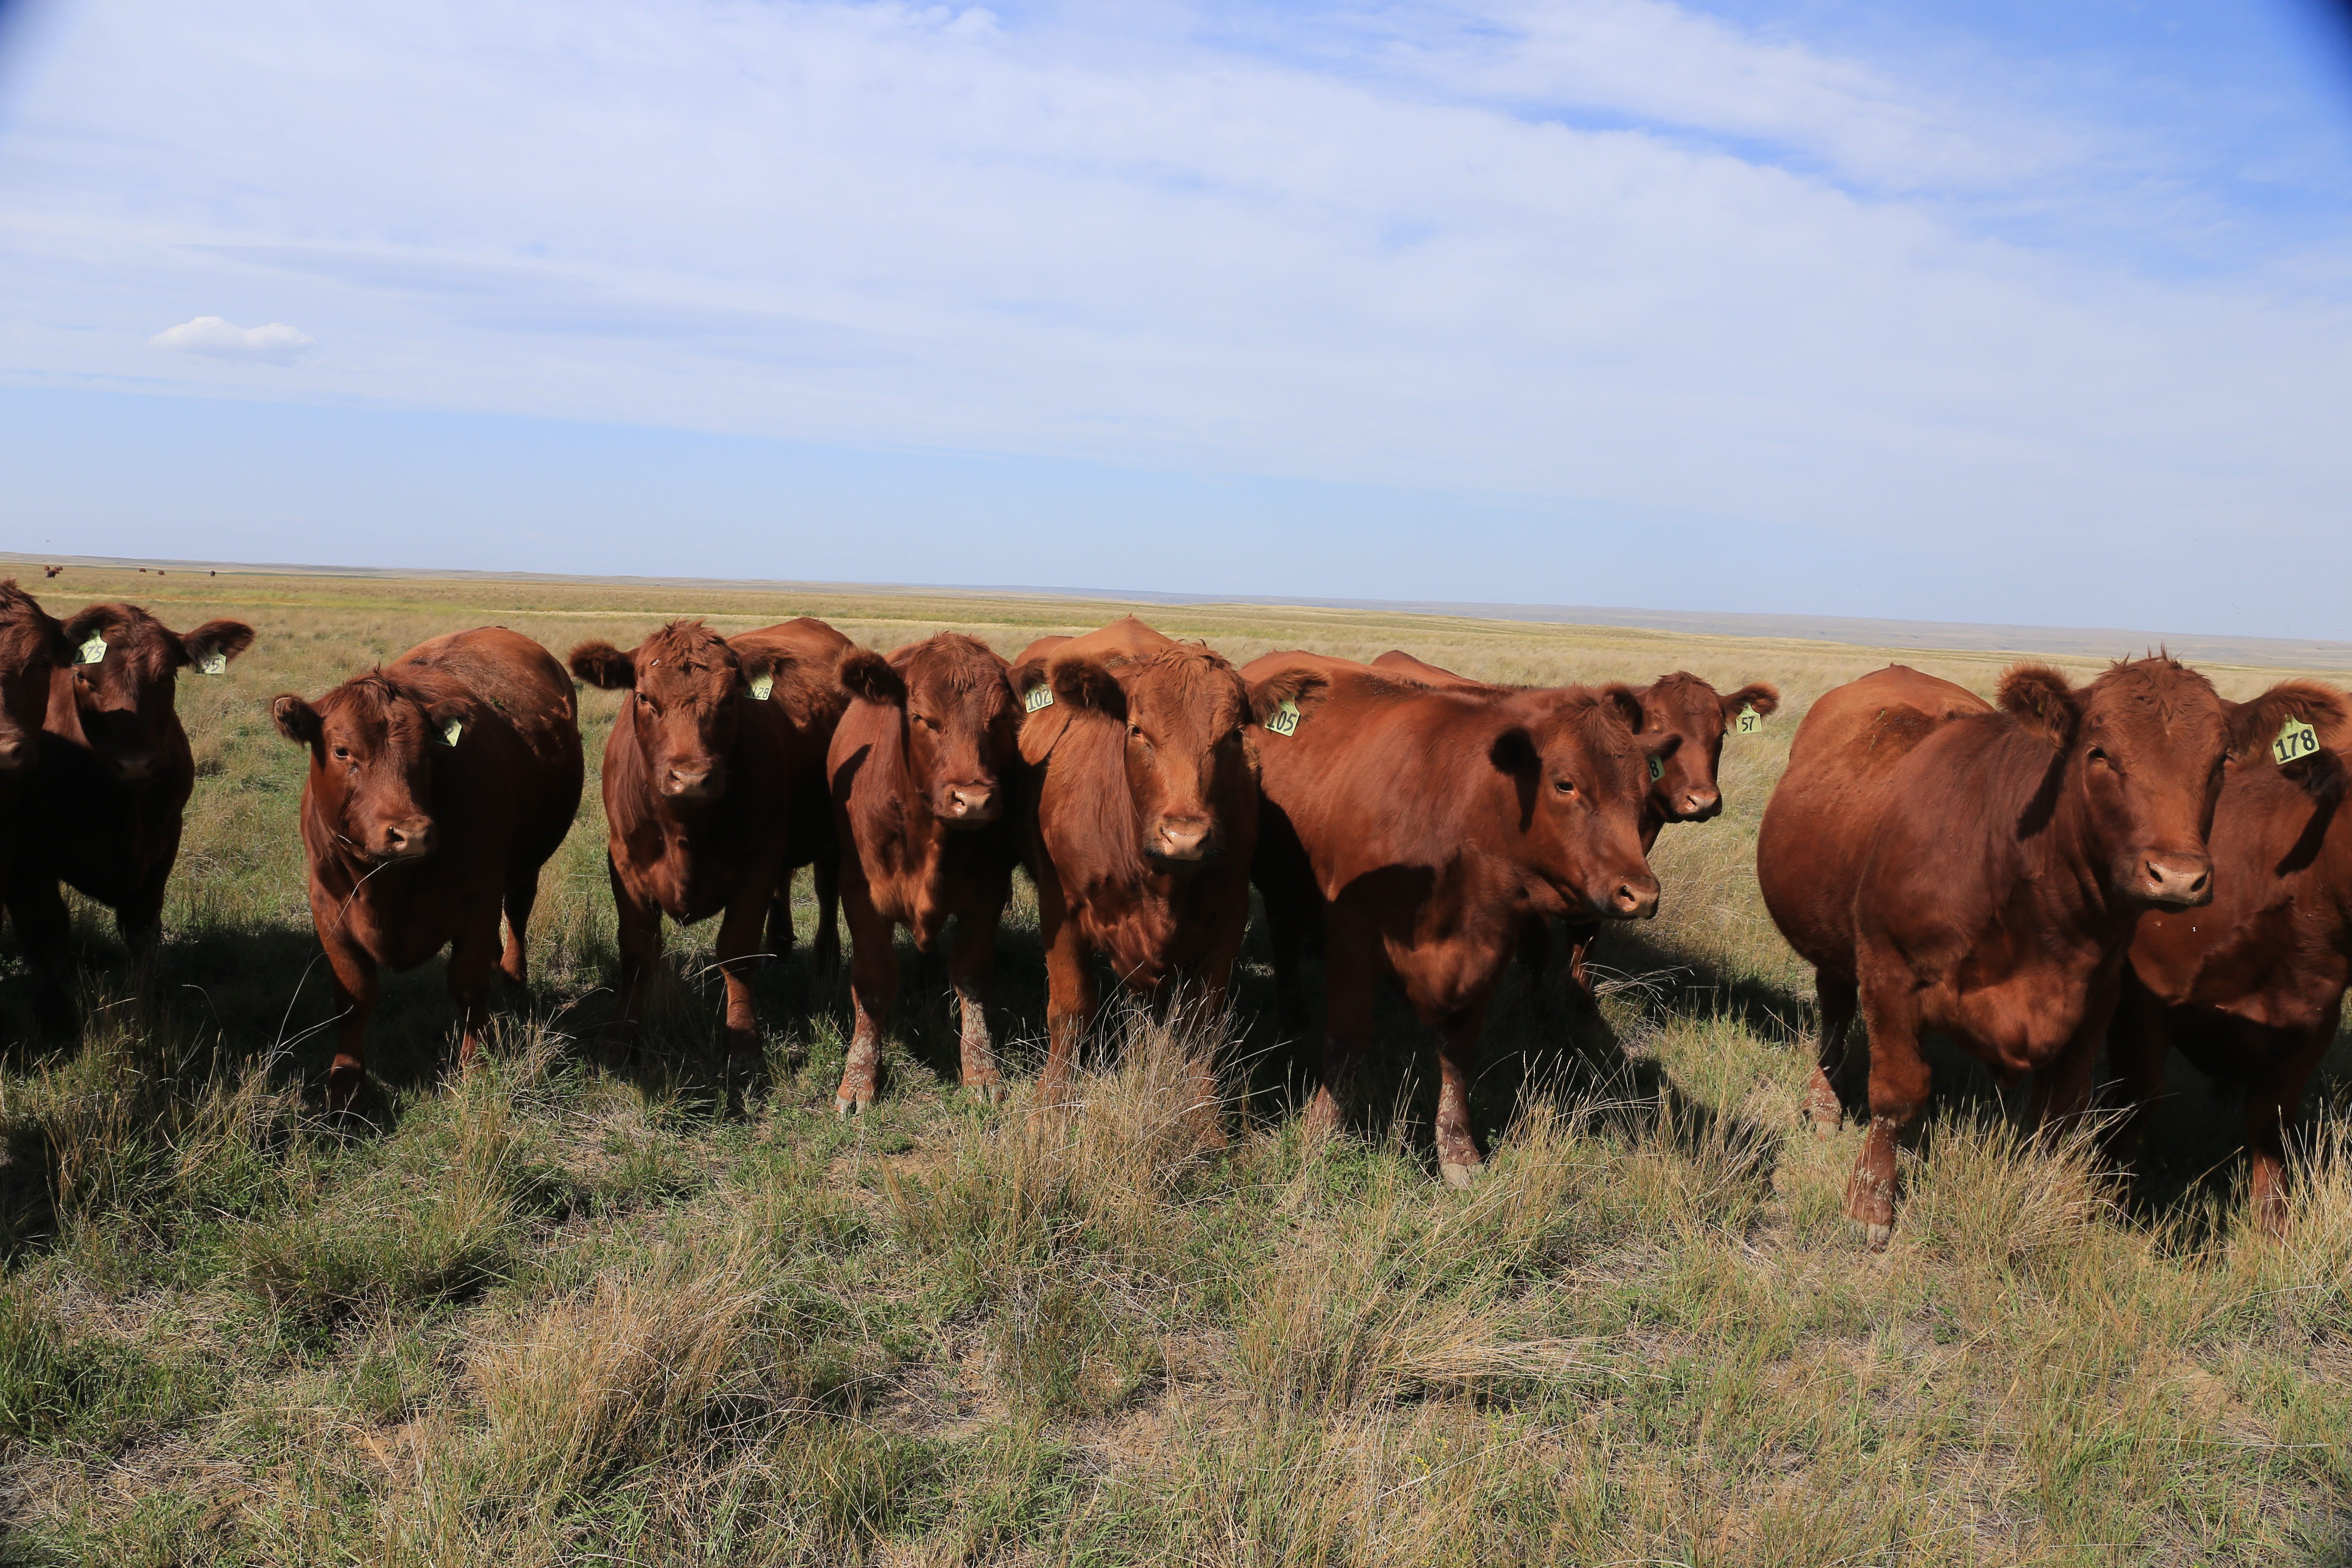 Cattle LG